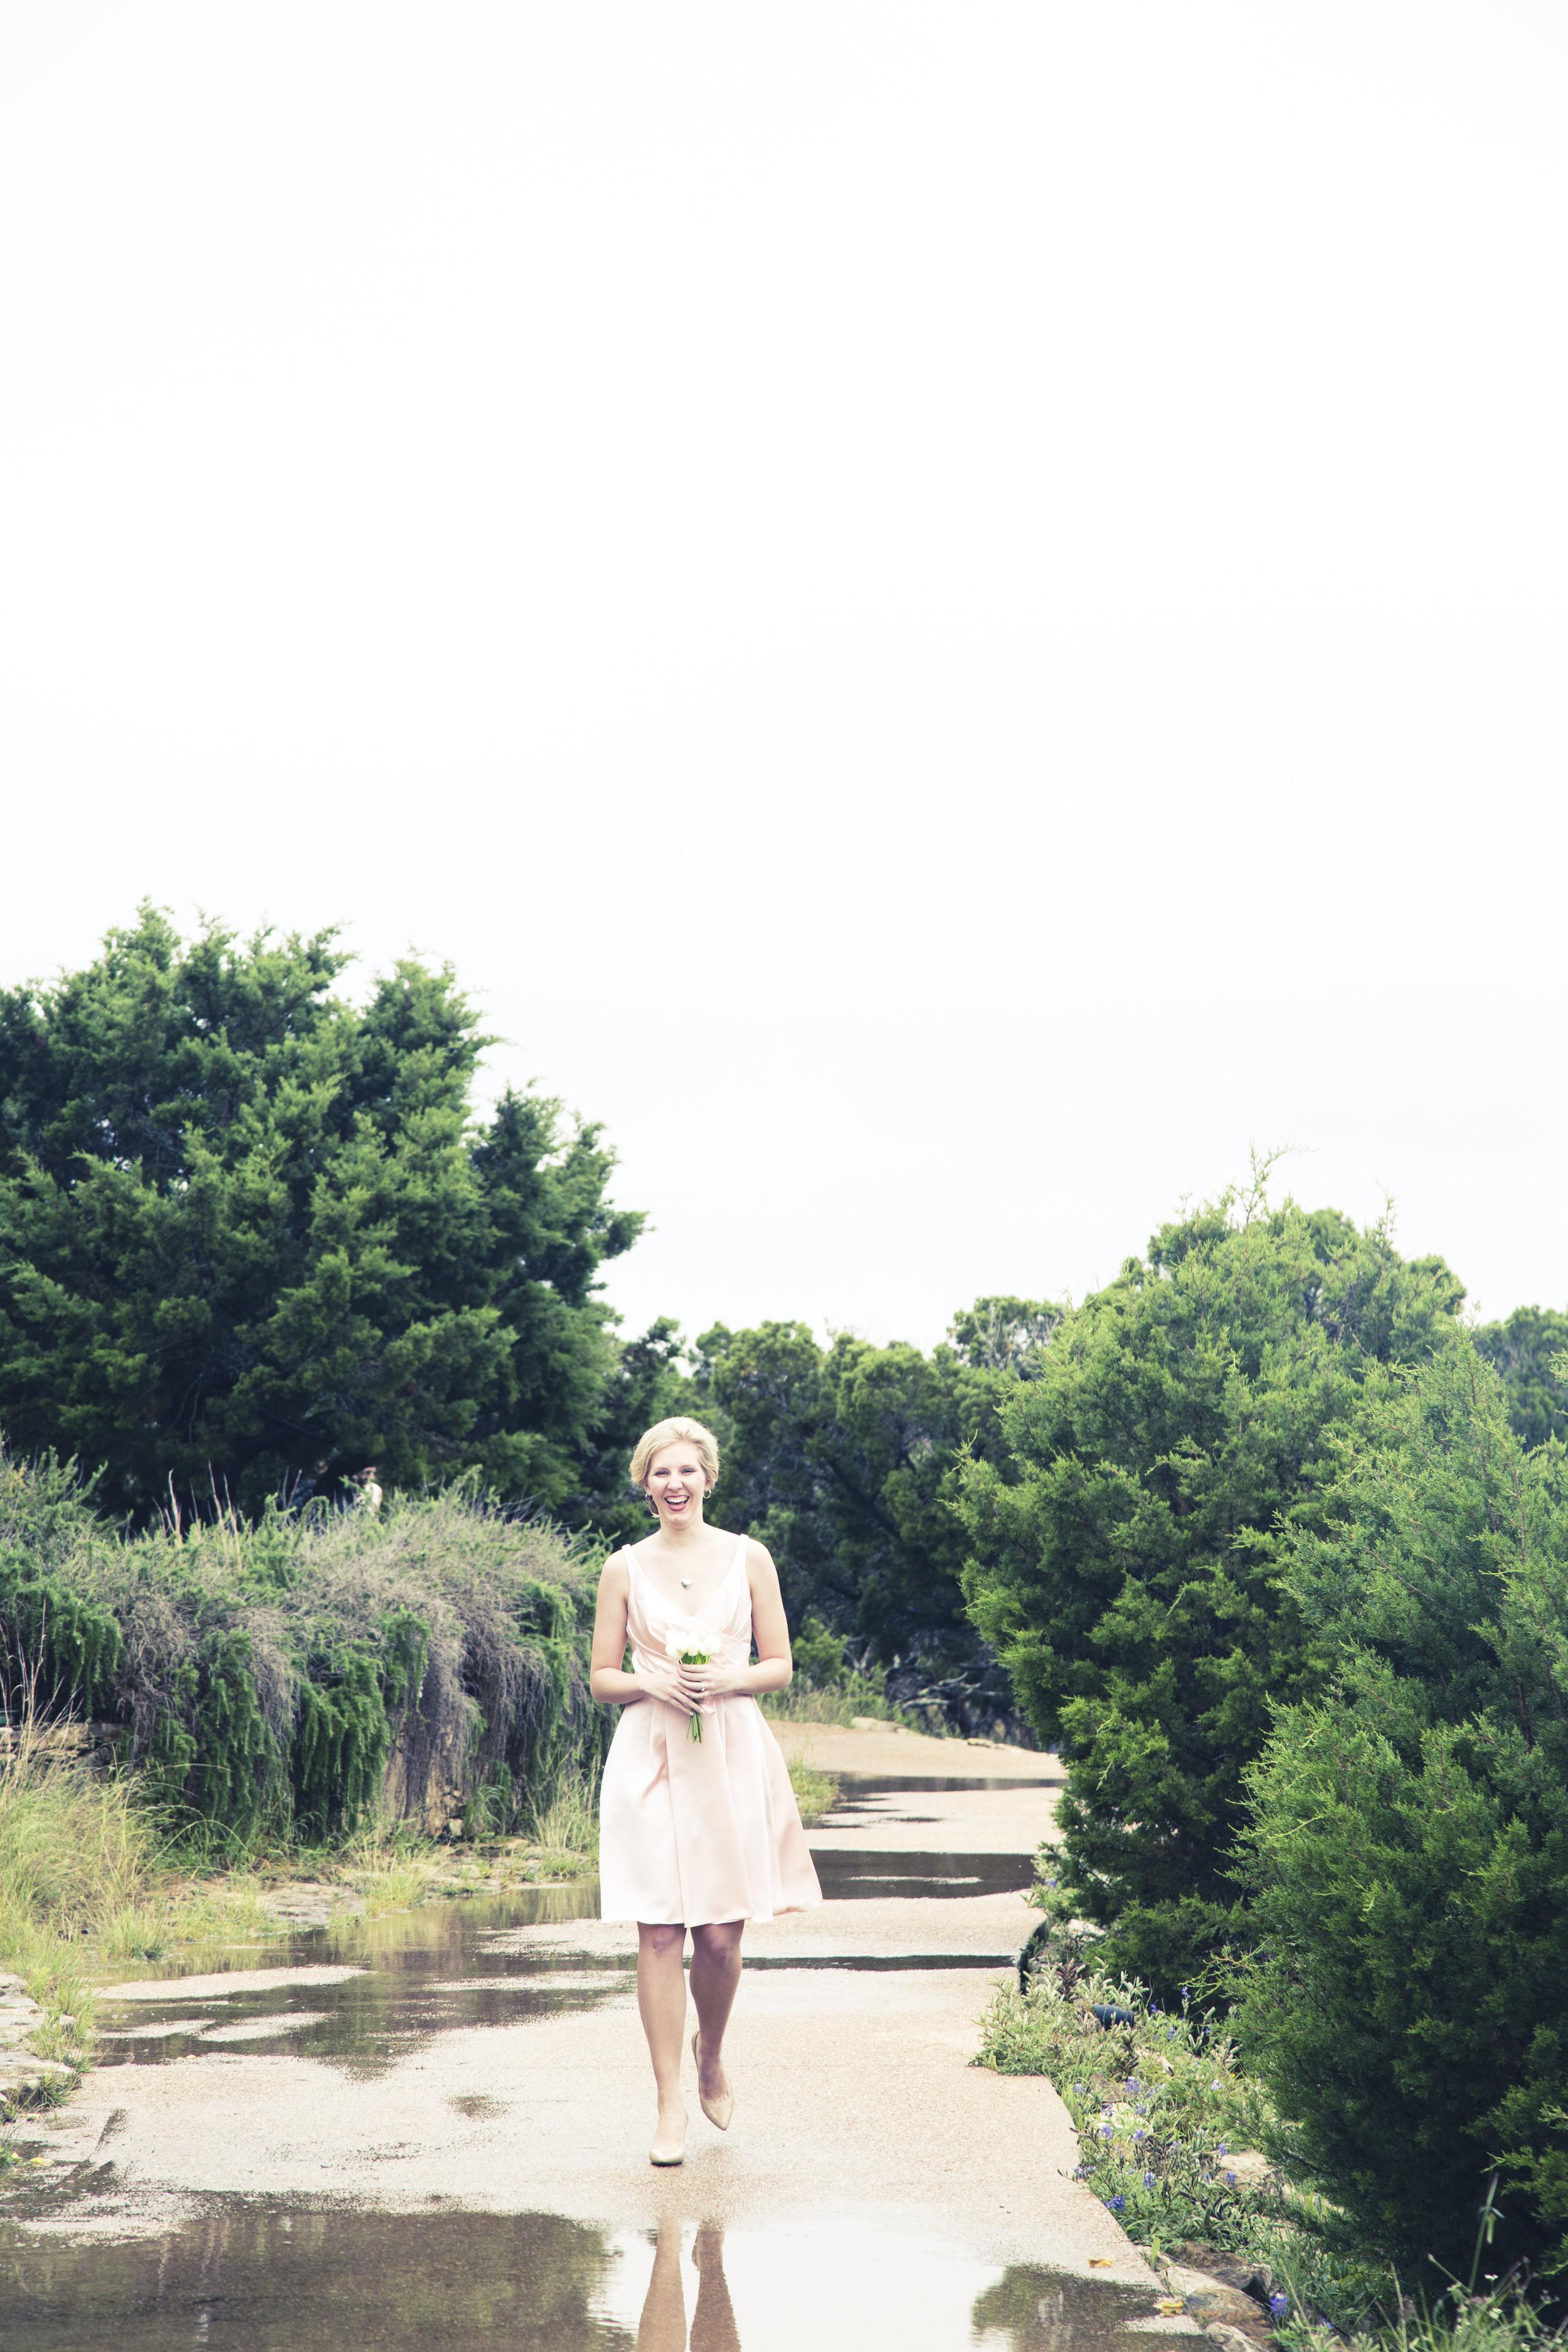 ATGI_Nicole & Patrick Wedding_2016_2S8A6393.jpg